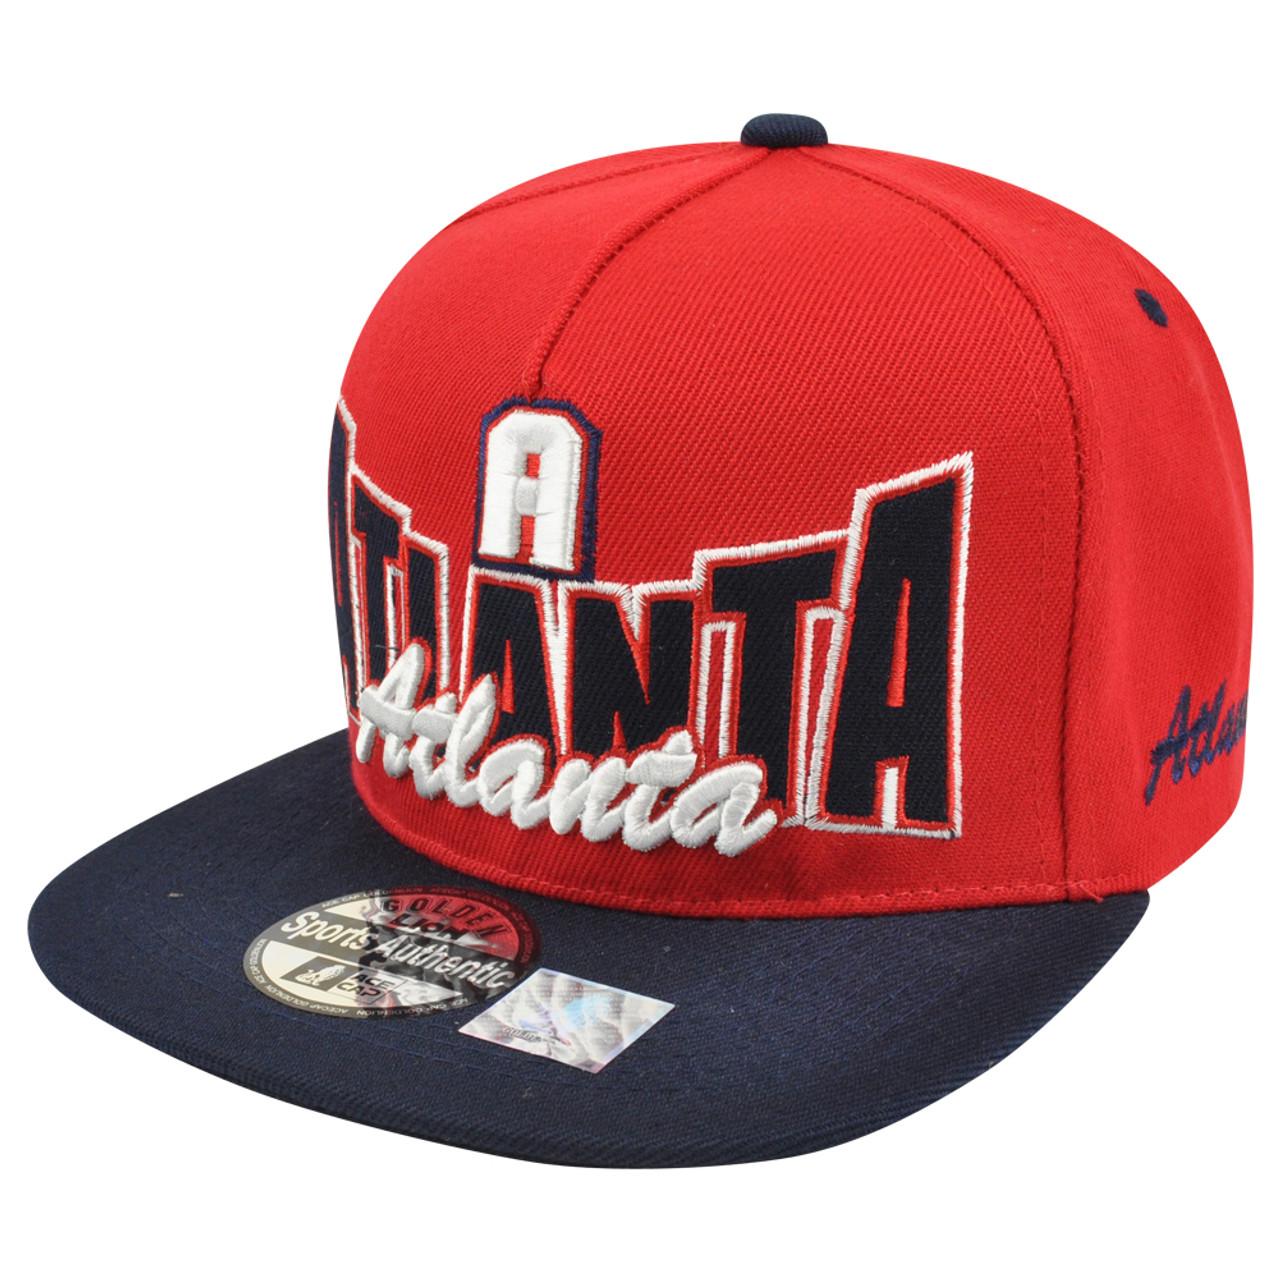 Atlanta DownTown Style Two Tone Snapback Hat Cap